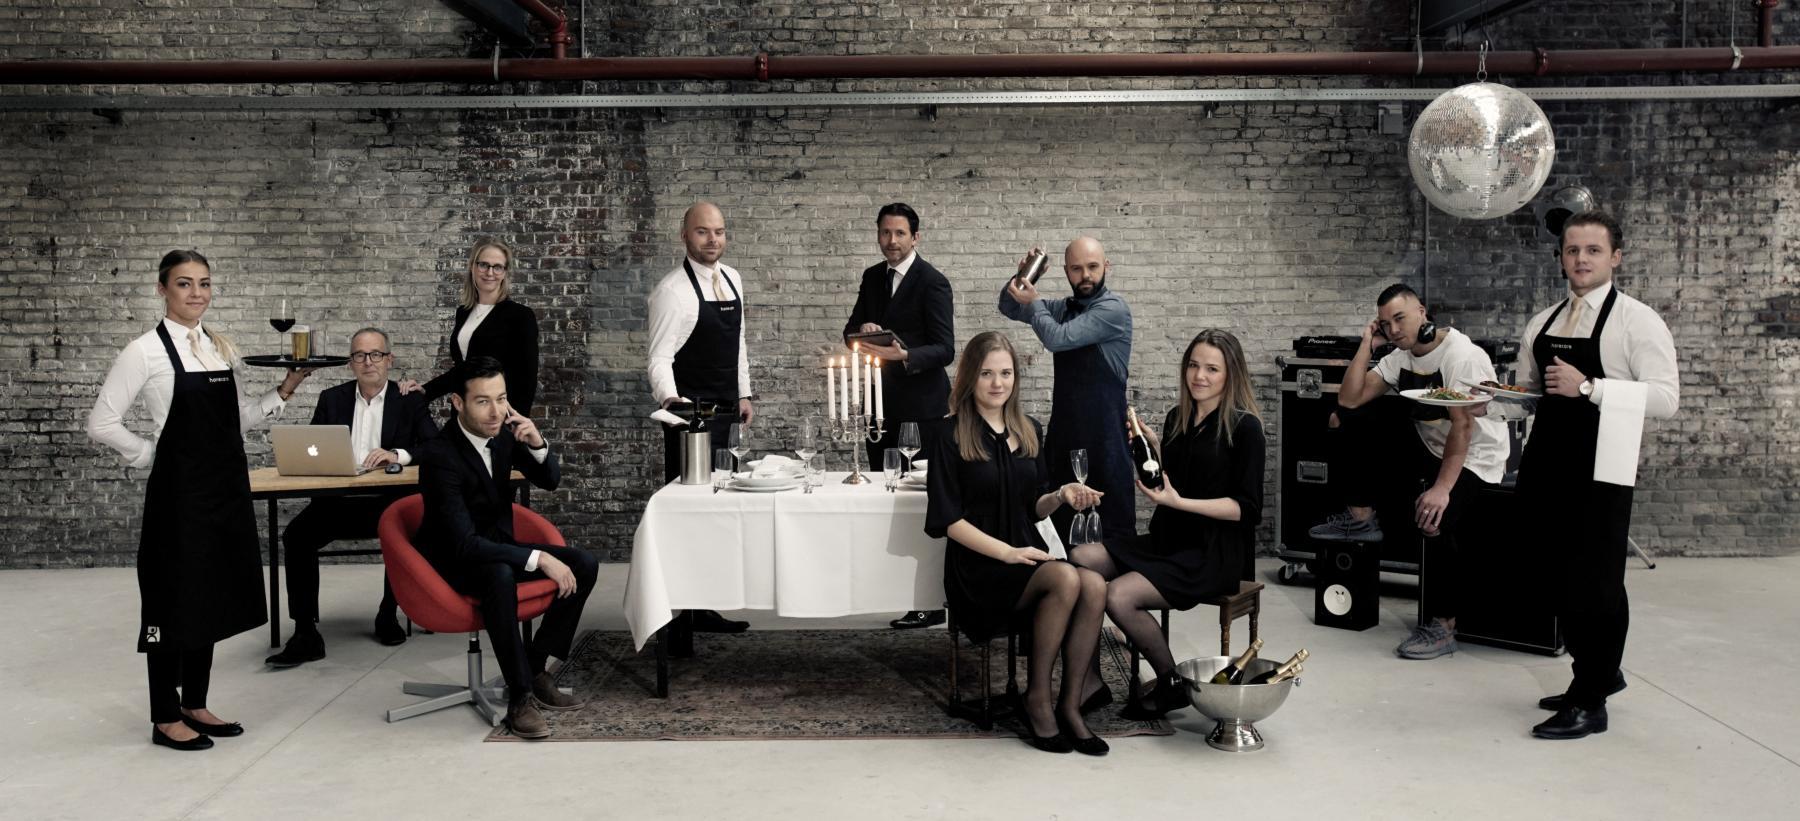 www.horecare.eu baan Eindhoven Personeel Events Payroll Maastricht Limburg Eindhoven Brabant